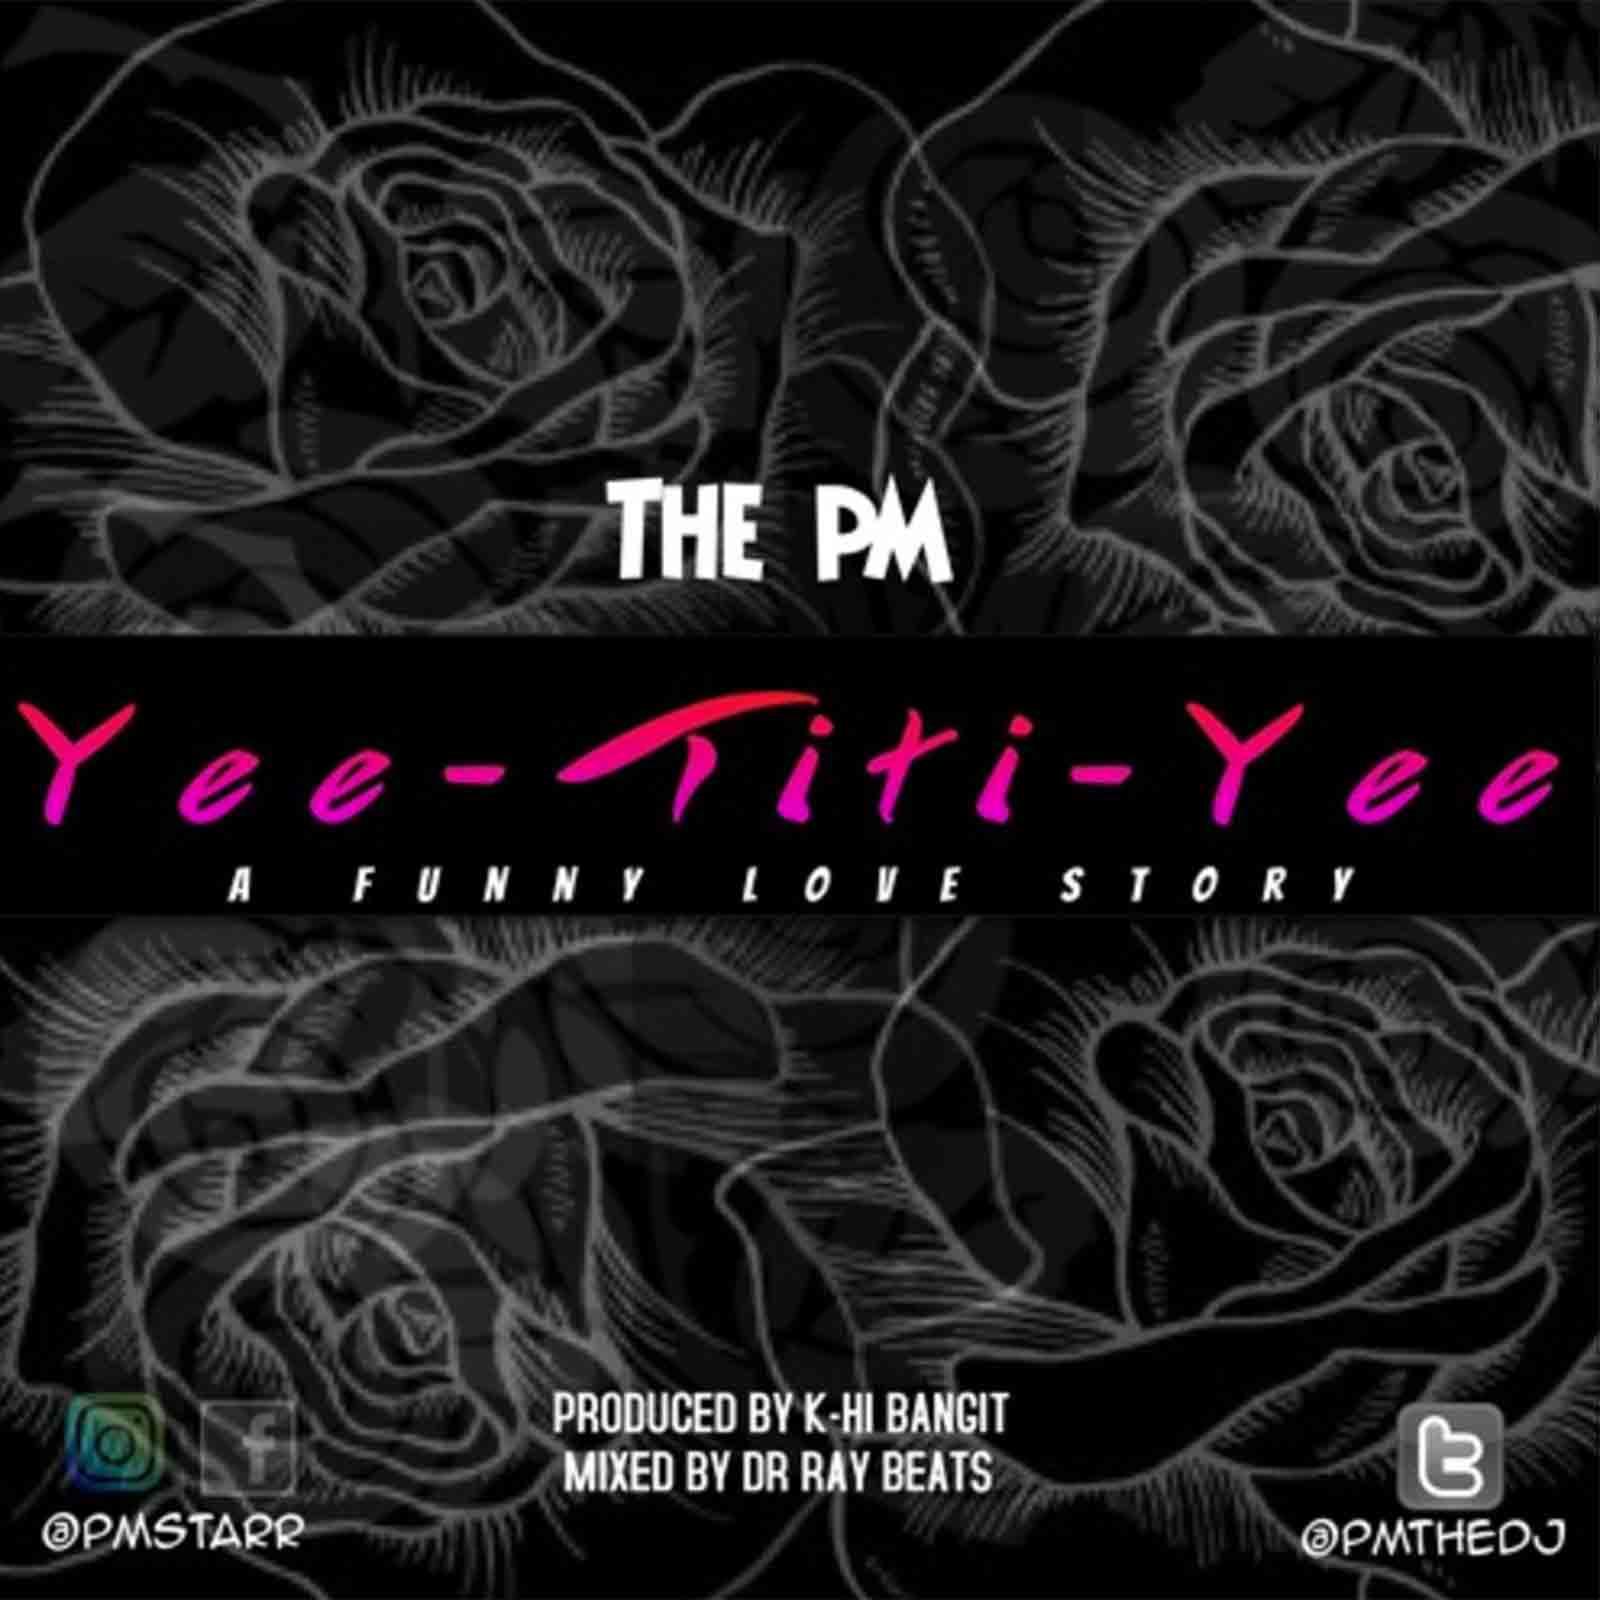 Yee Titi Yee by The PM